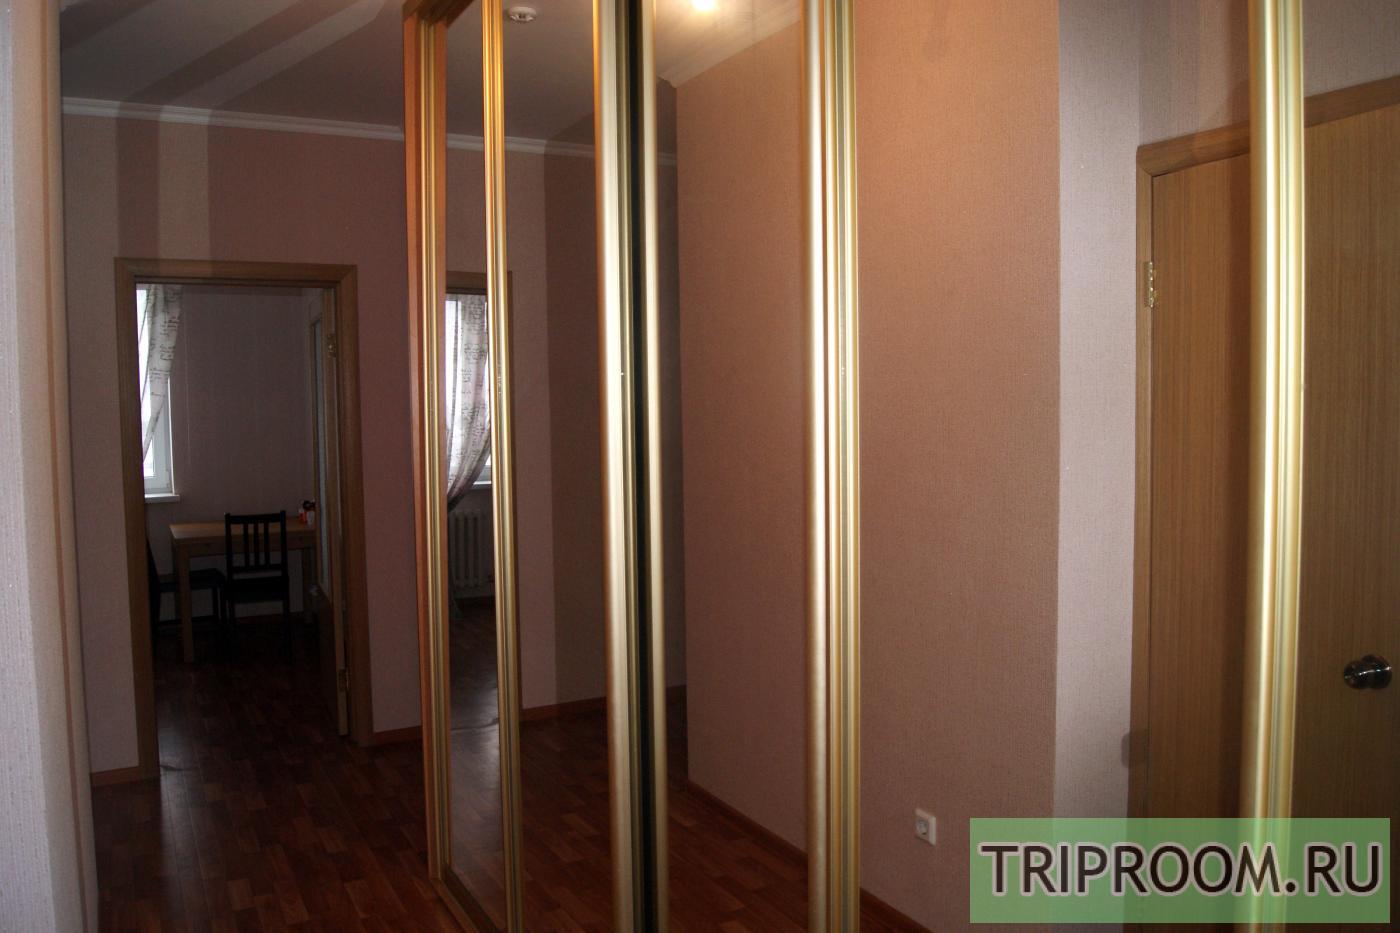 1-комнатная квартира посуточно (вариант № 16809), ул. п.смородина, фото № 5